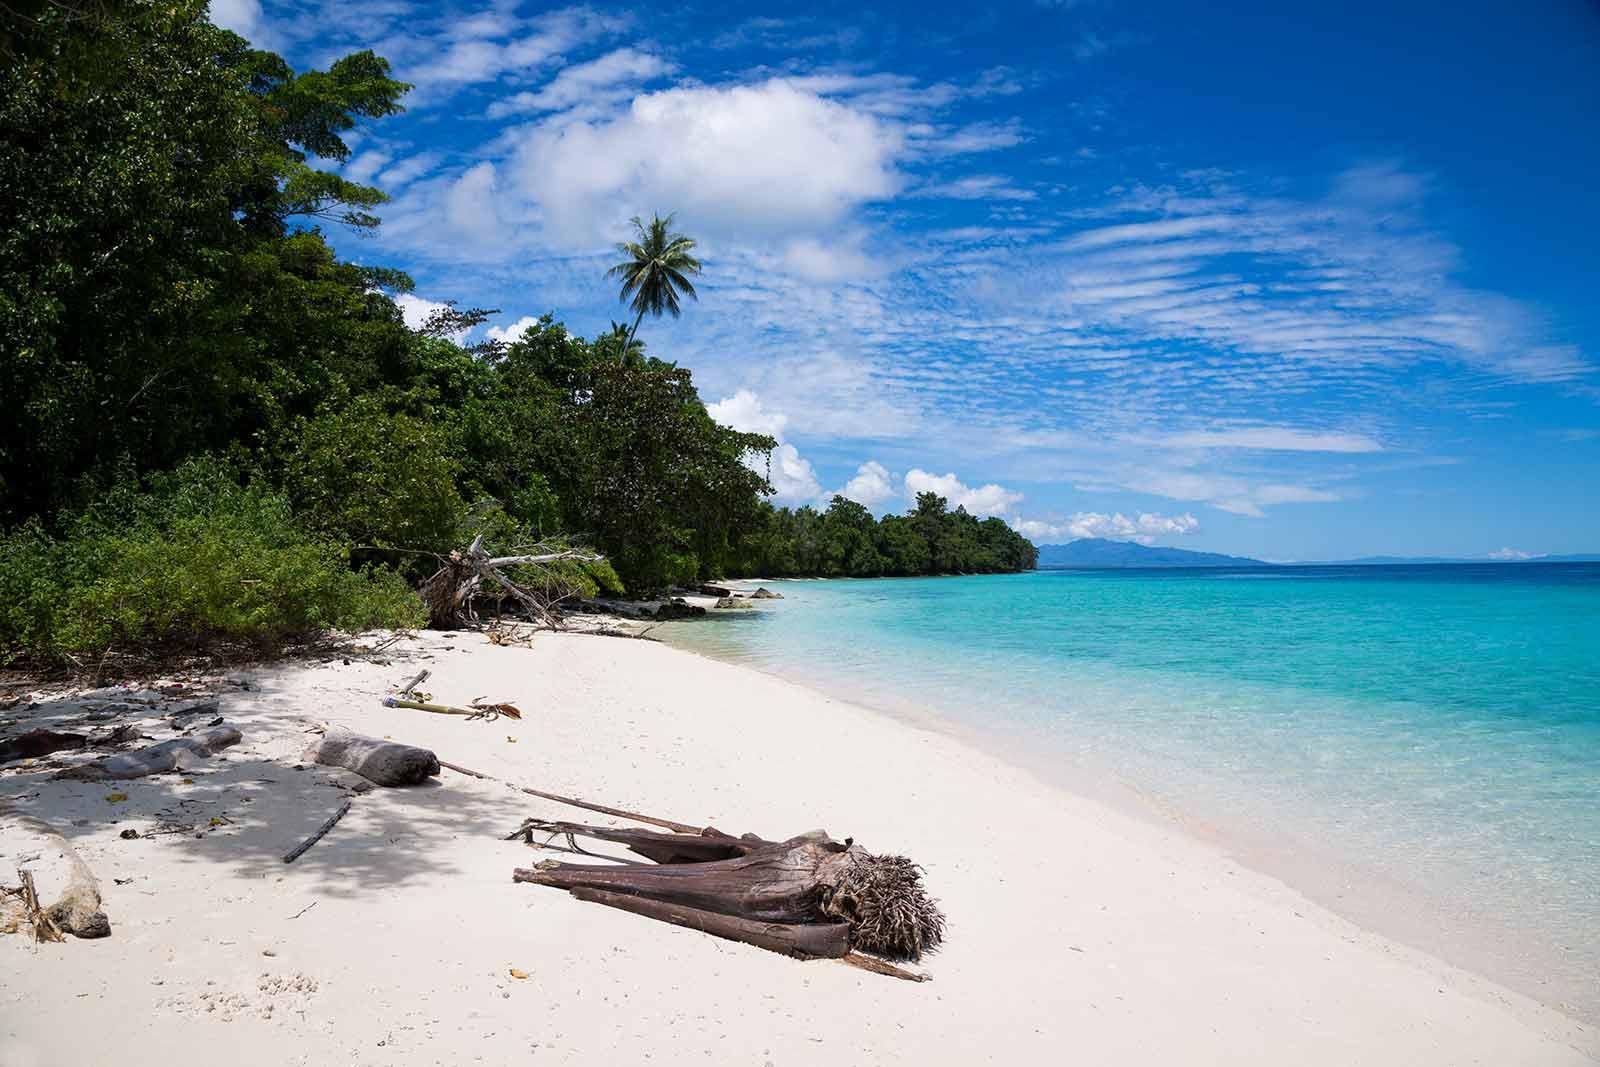 Maluku Islands: Saparua beach paradise.